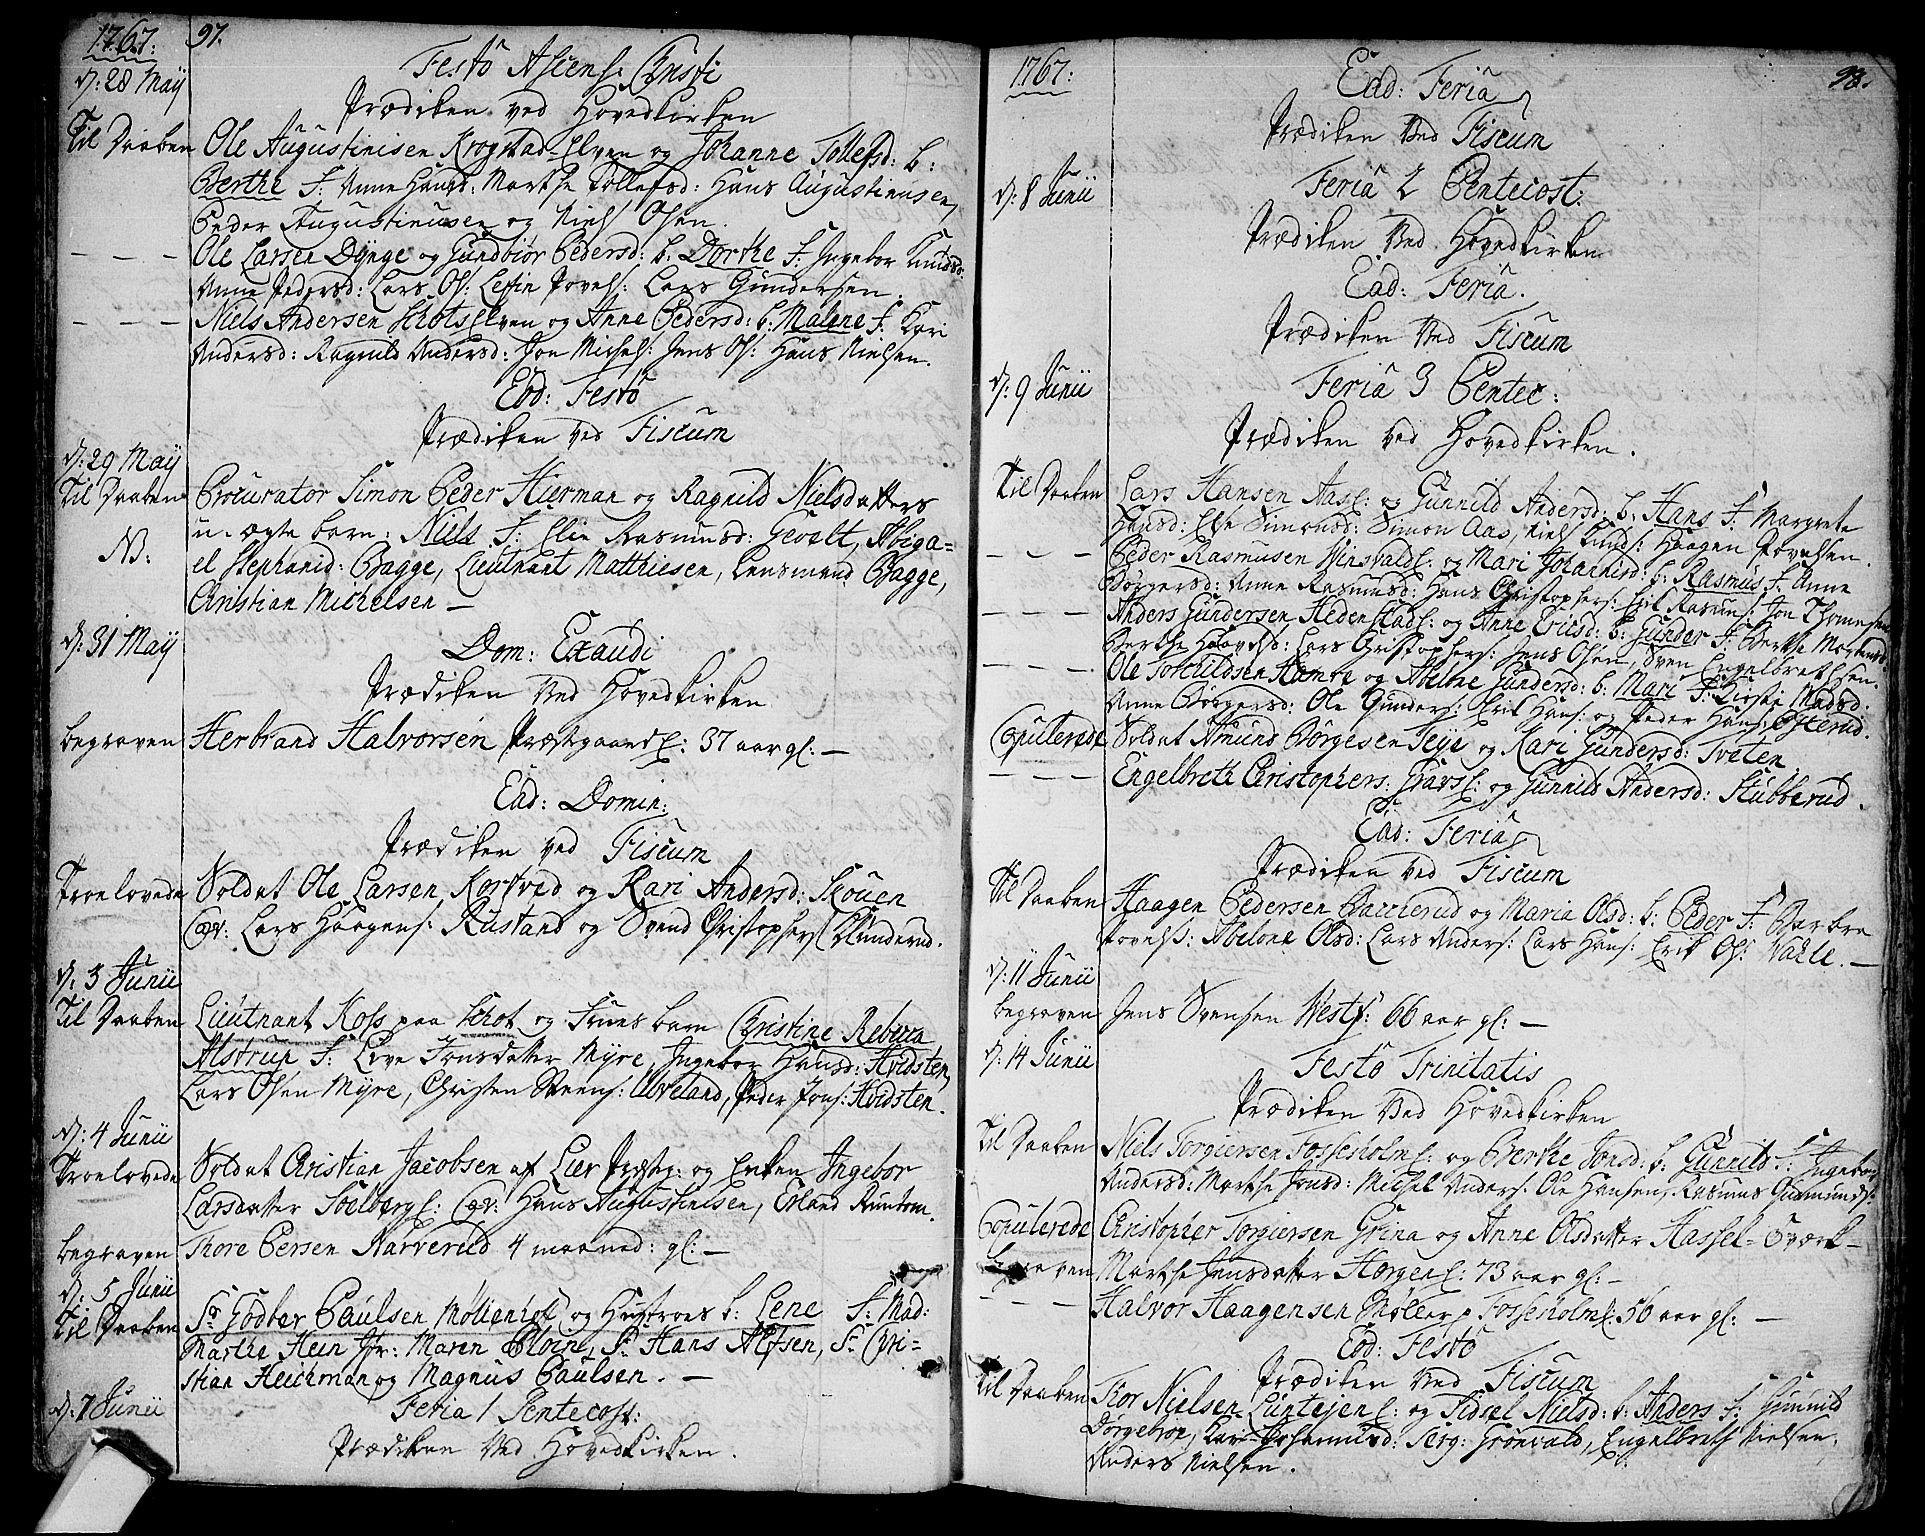 SAKO, Eiker kirkebøker, F/Fa/L0008: Ministerialbok nr. I 8, 1764-1788, s. 97-98